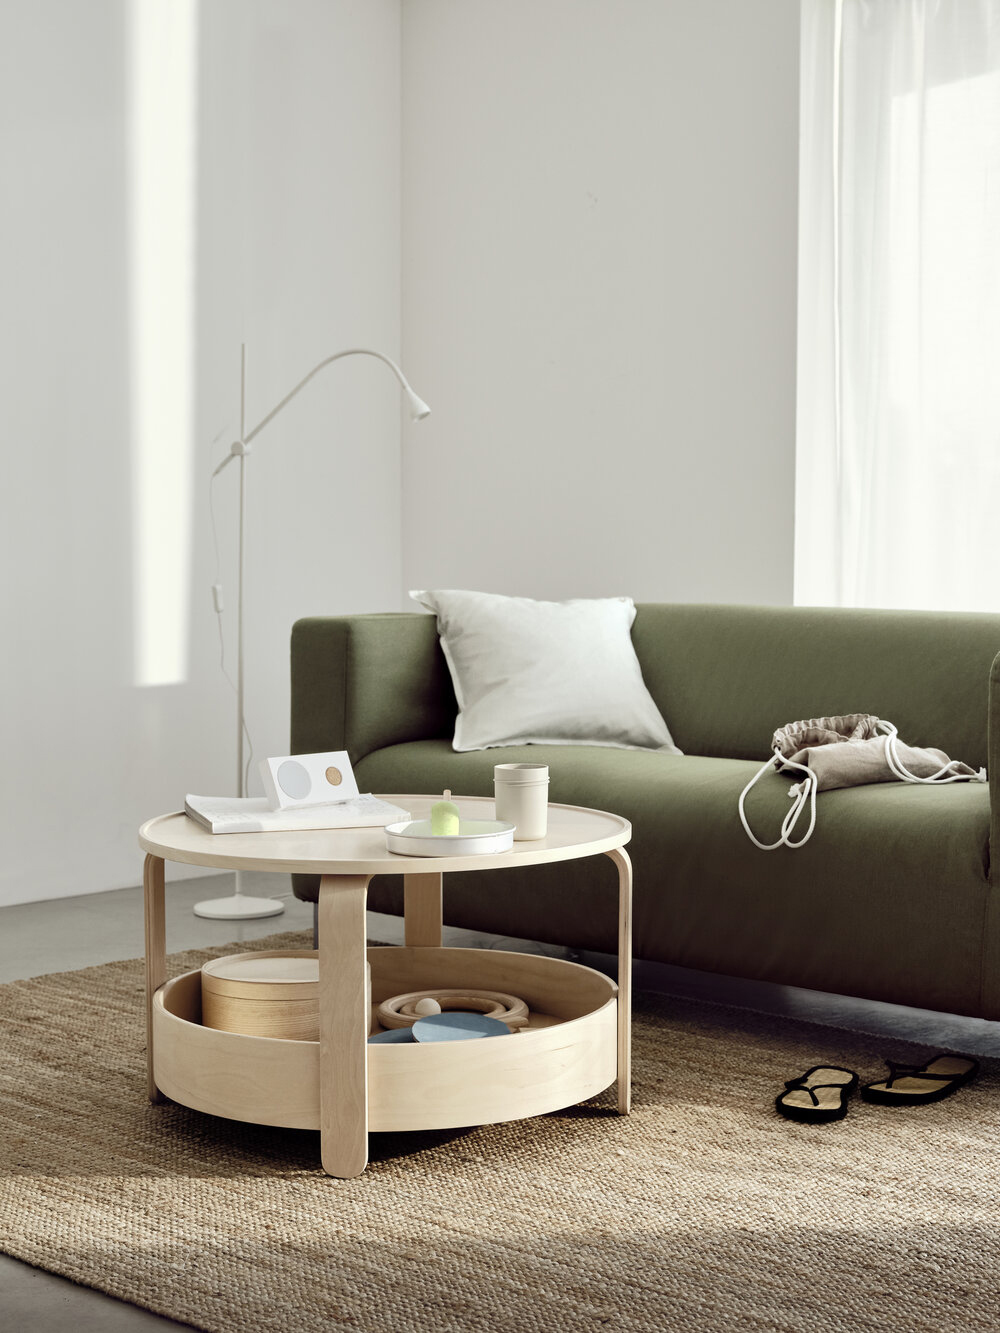 《IKEA》2021春夏家居用品系列Lookbook